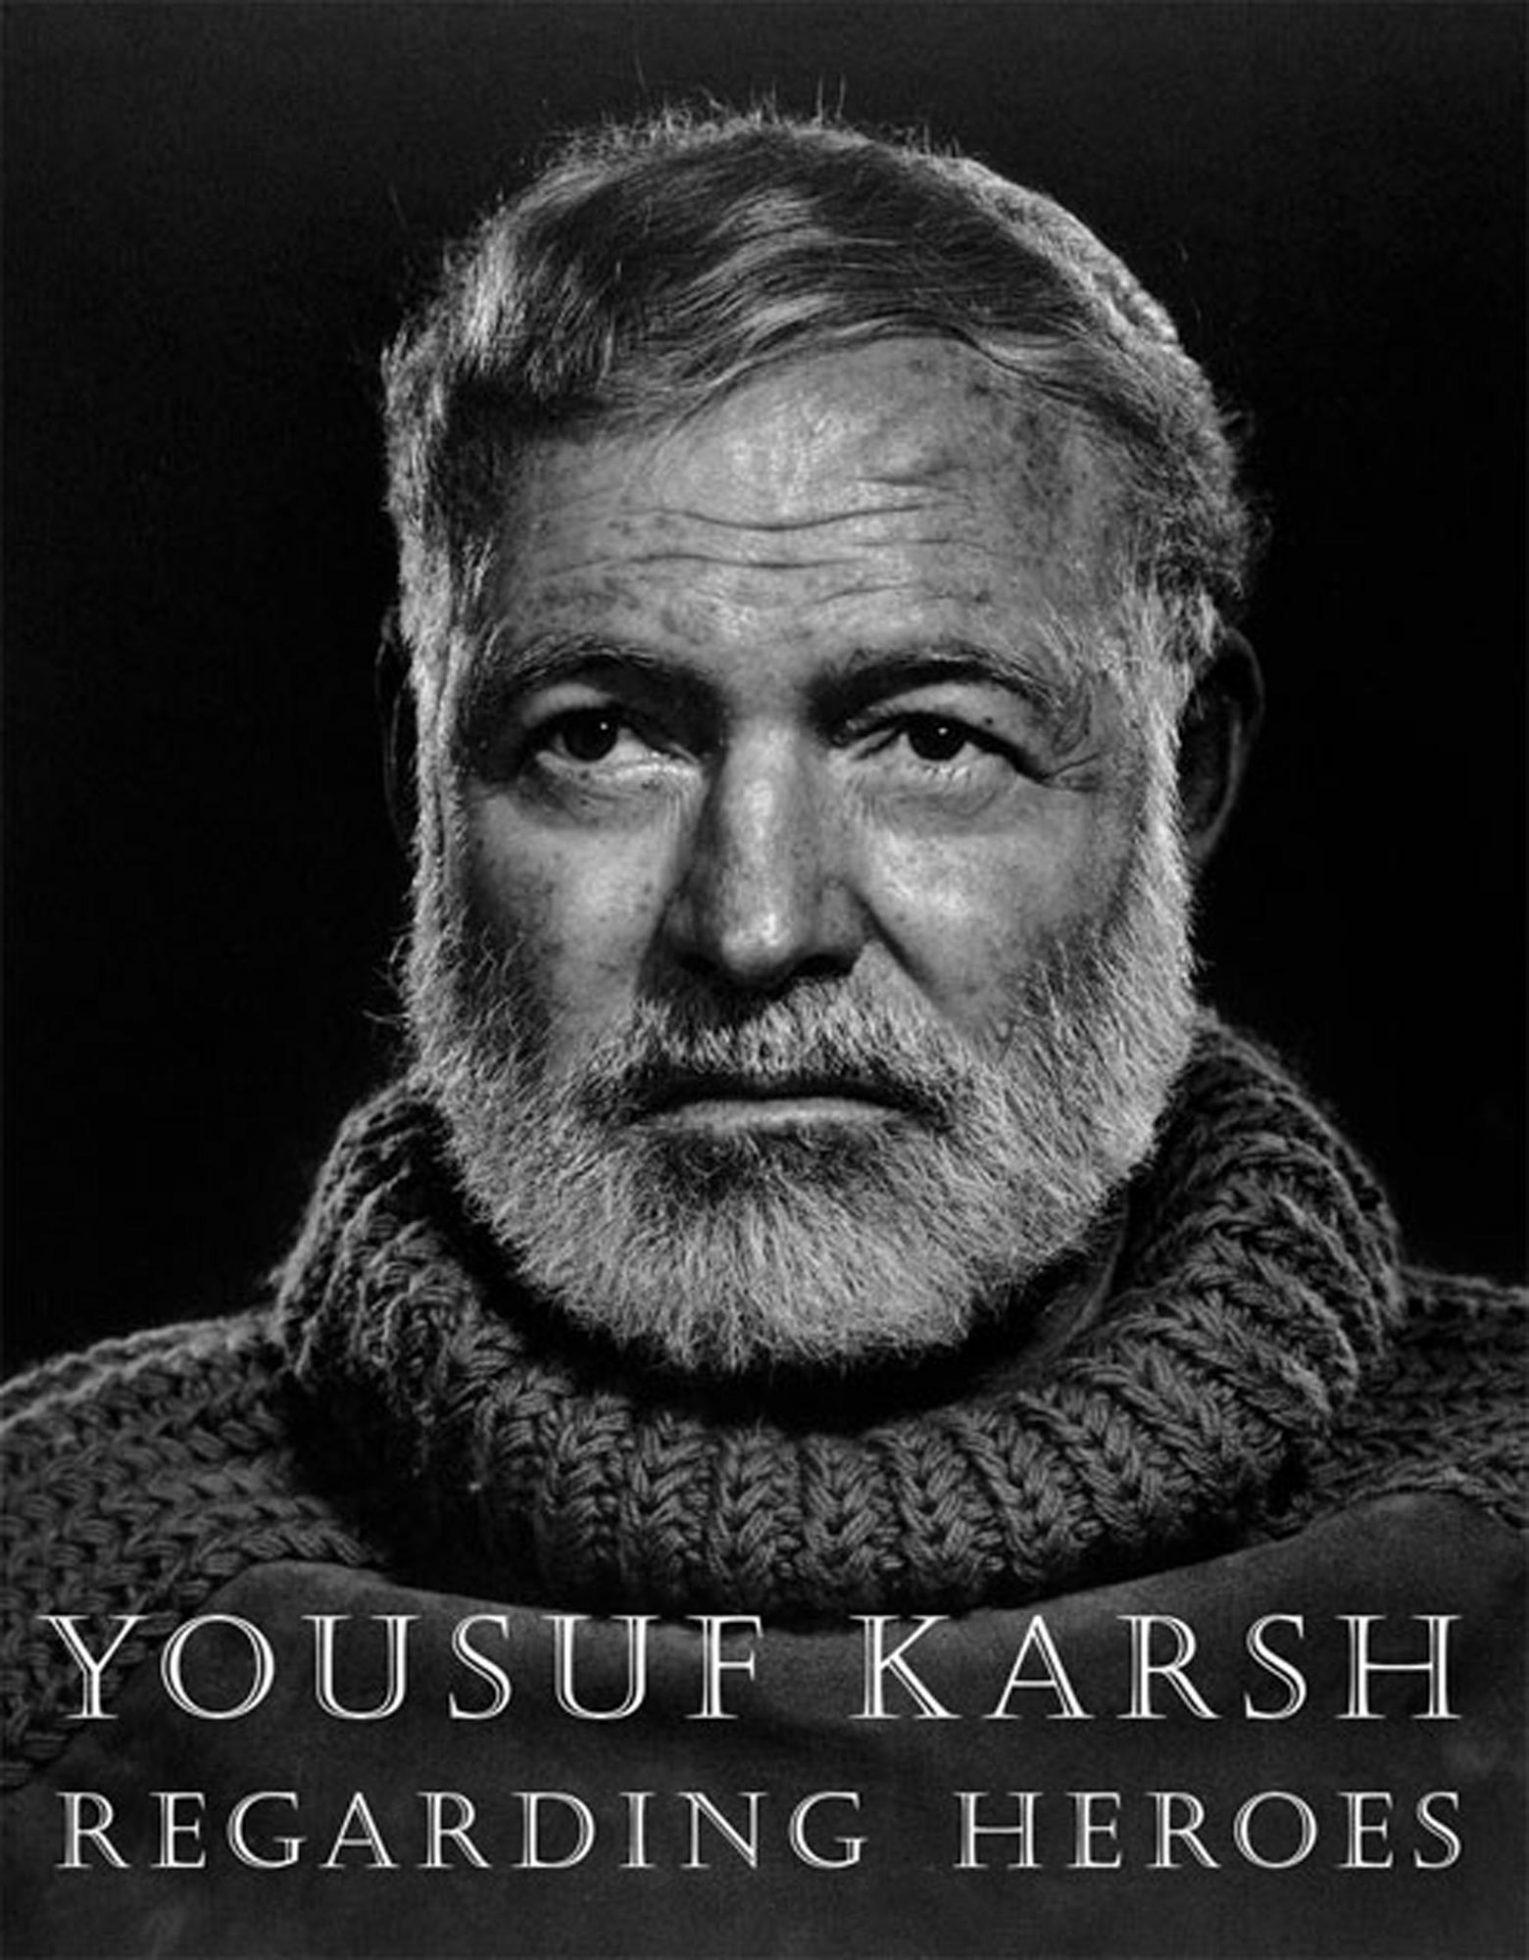 Yousuf Karsh: Regarding Heroes